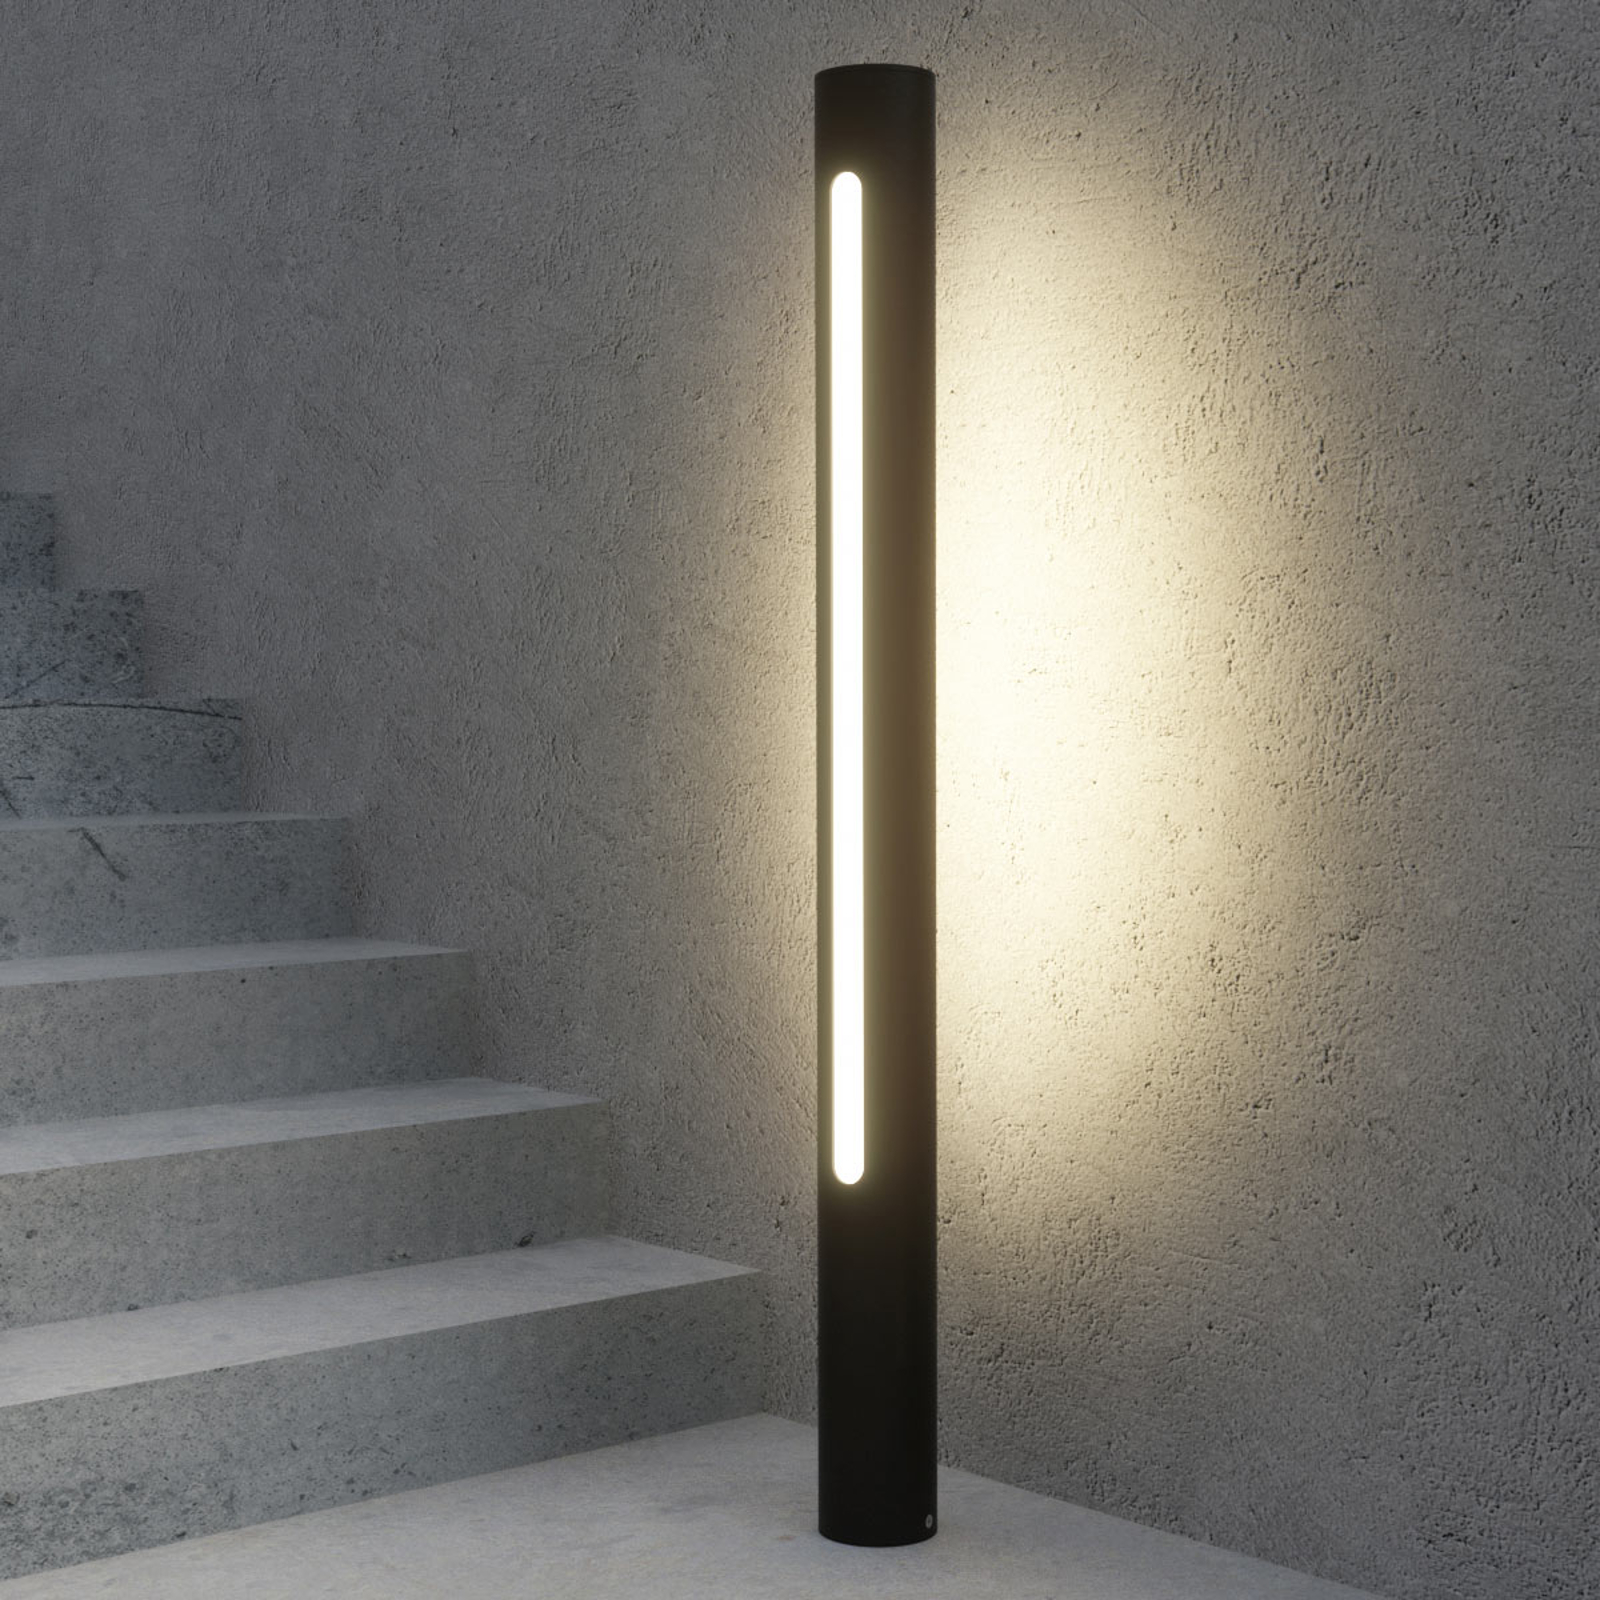 LED-Wegelampe Tomas, dunkelgrau